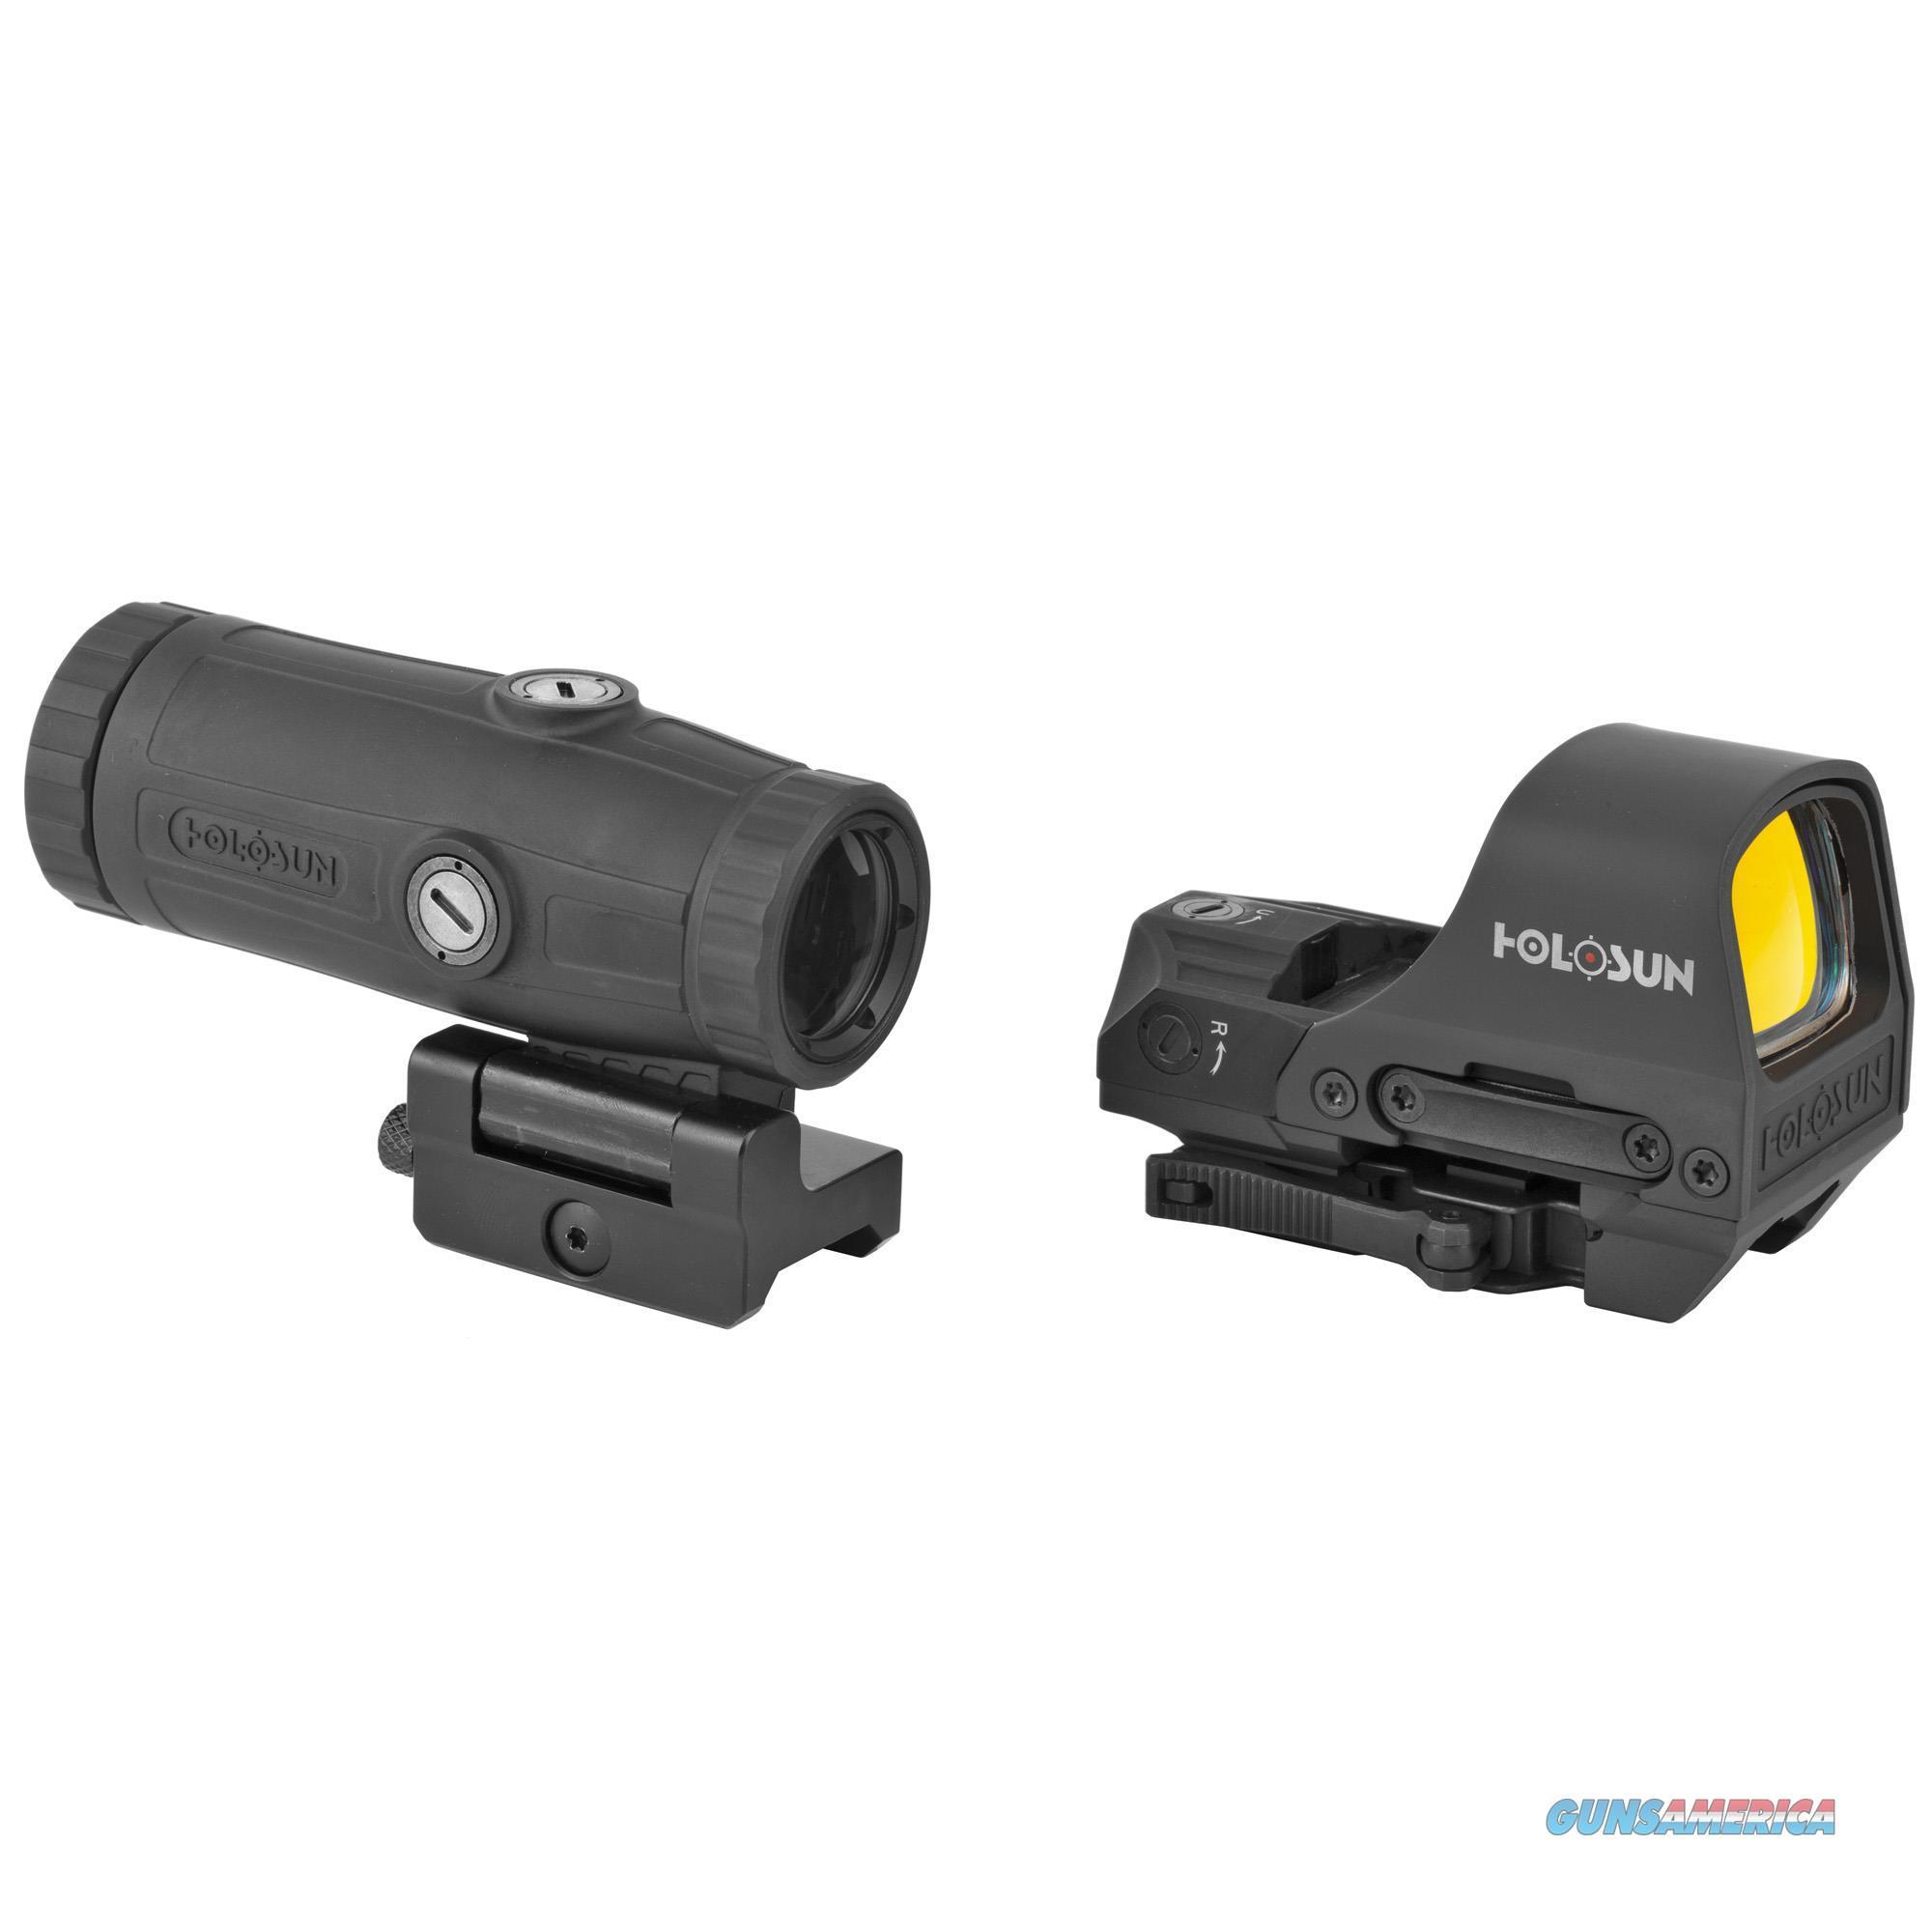 Holosun Technologies HS10C Open Reflex With HM3X Magnifier  Non-Guns > Scopes/Mounts/Rings & Optics > Tactical Scopes > Red Dot